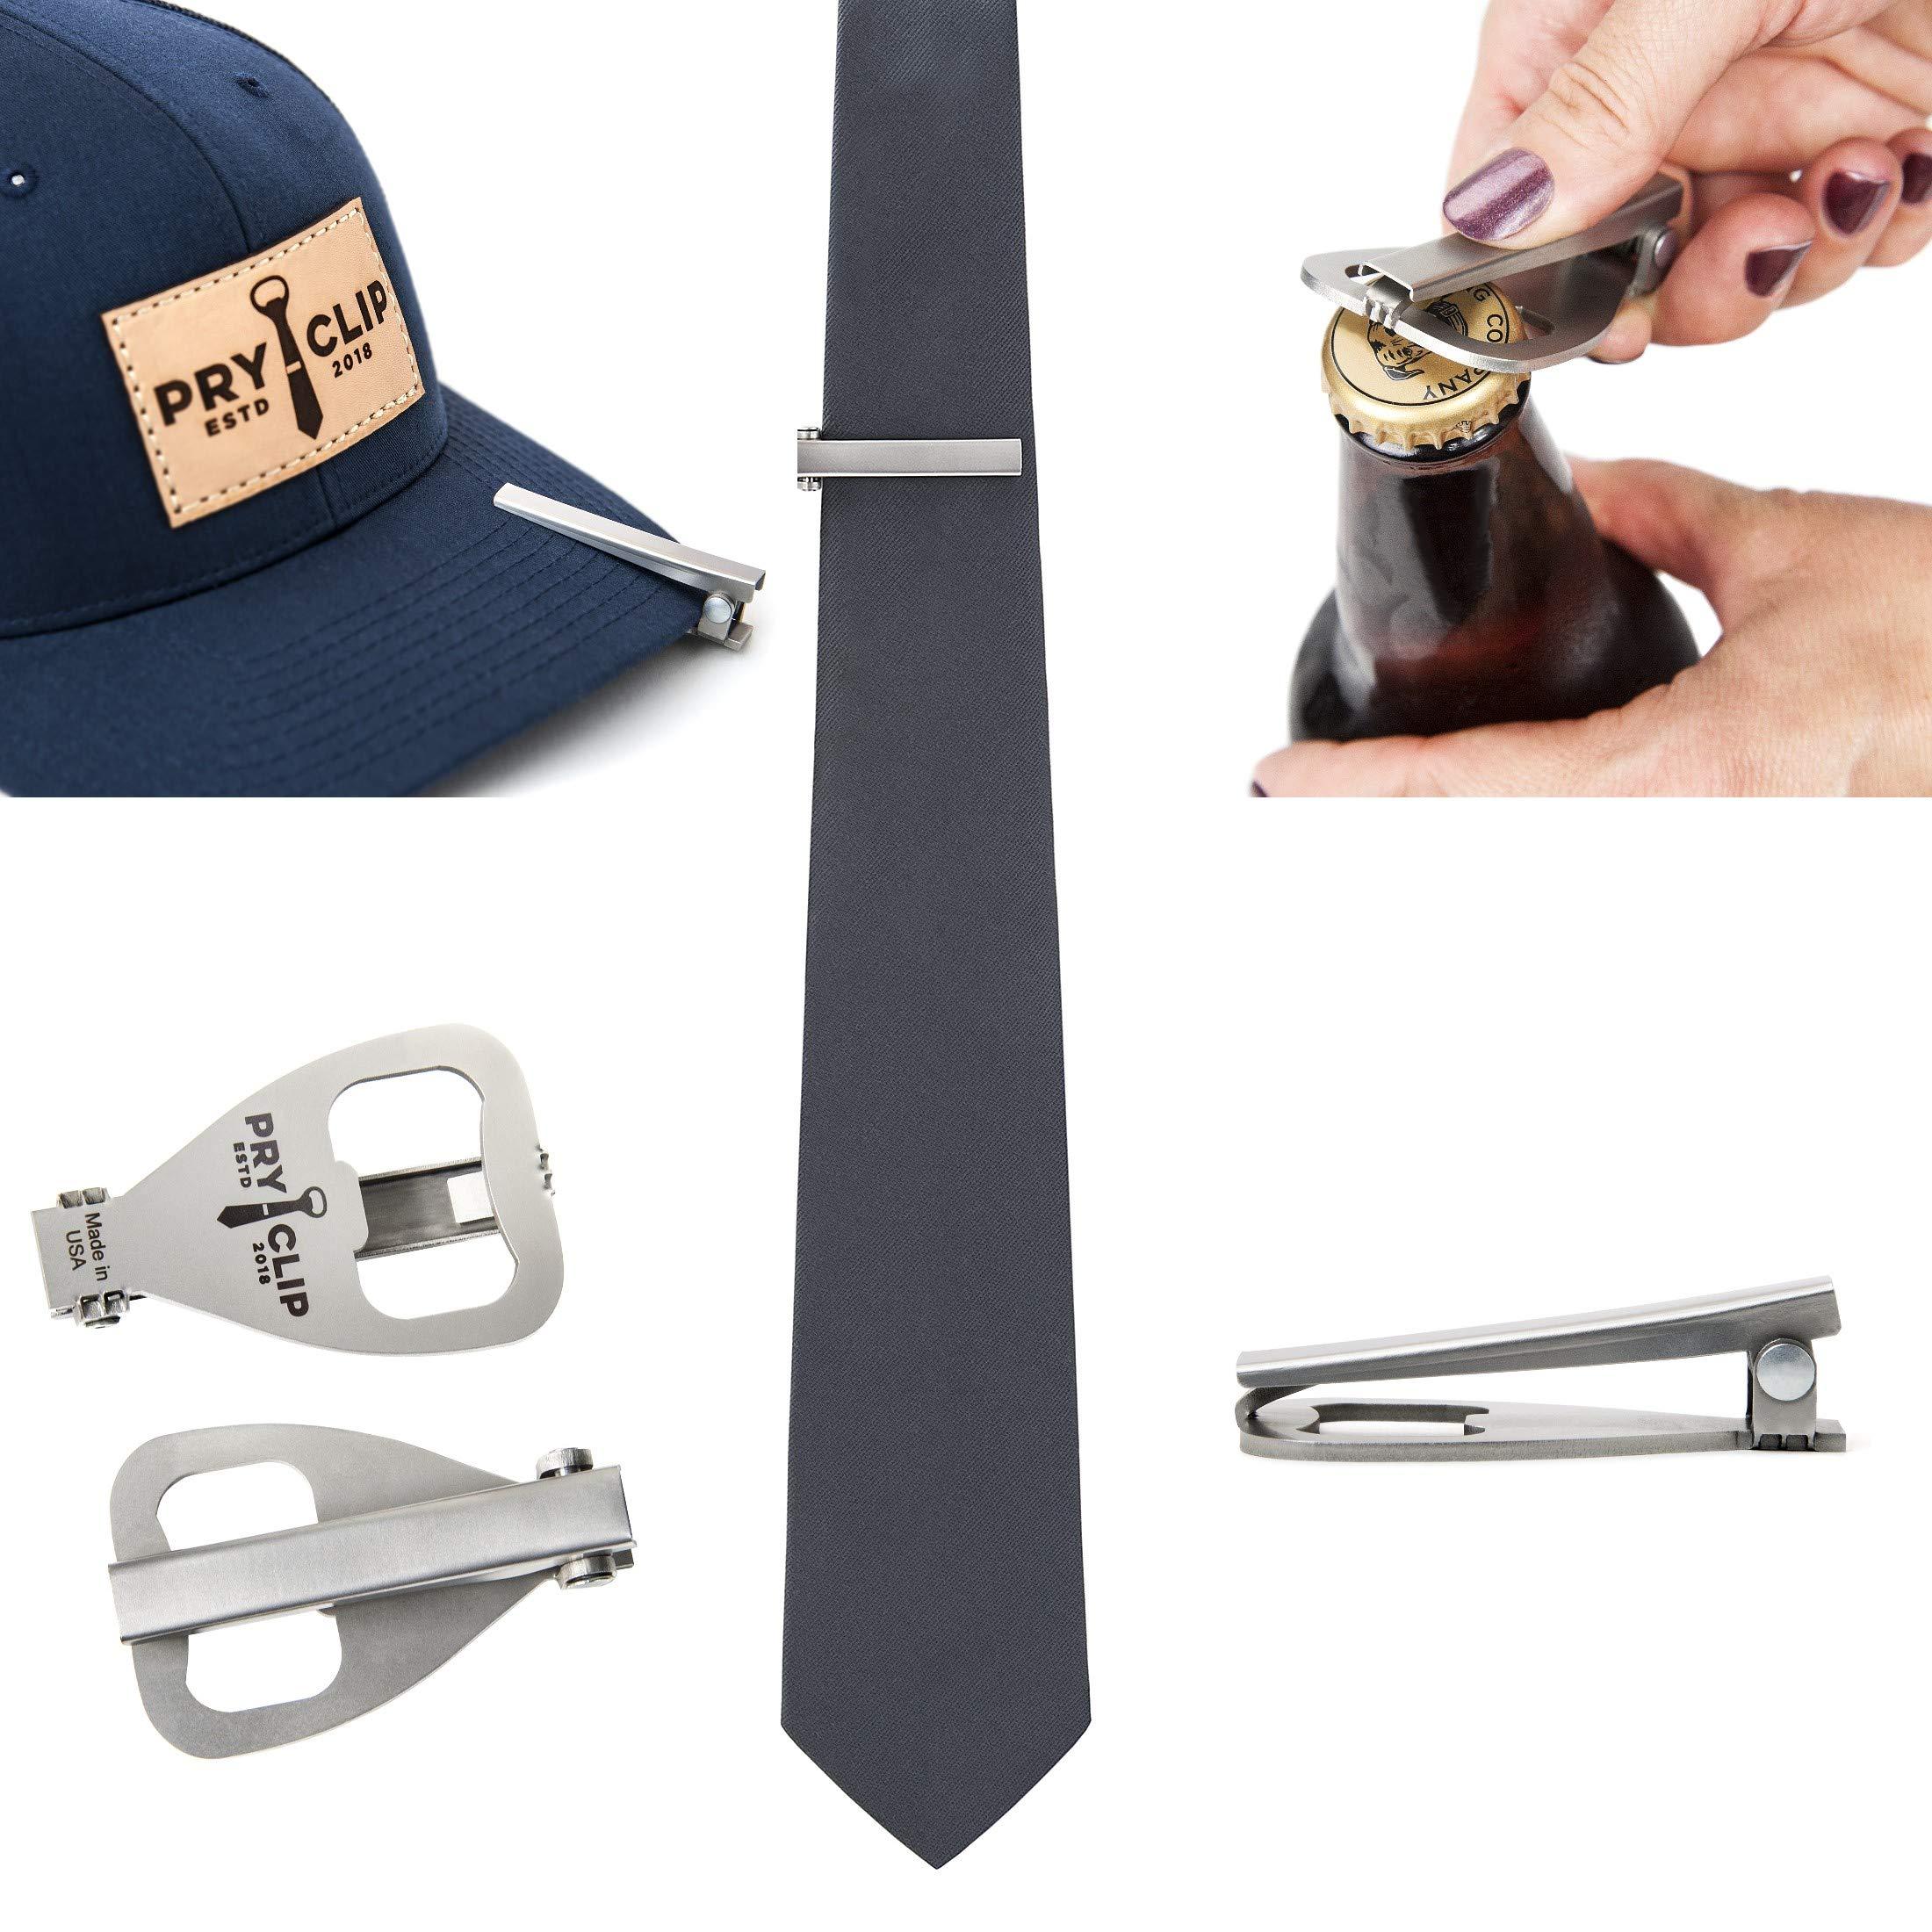 PRYCLIP - Tie Clip Bottle Opener, Laser Engraved, Gift Bag Included by PRYCLIP (Image #6)